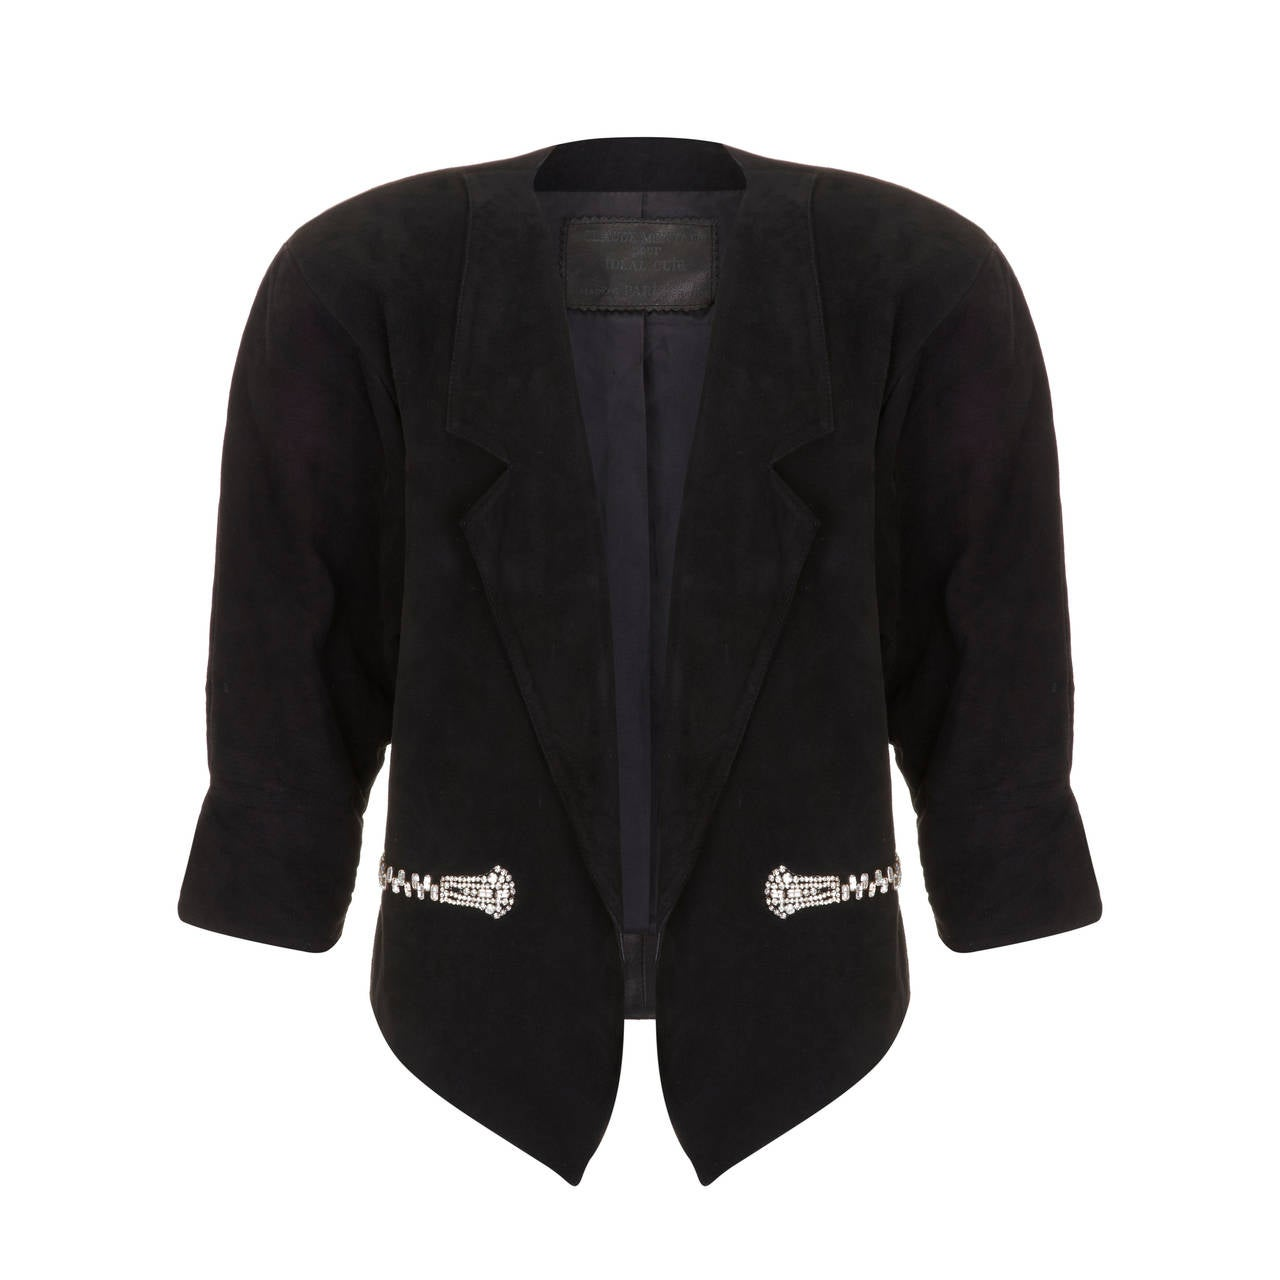 1980s Claude Montana Black Suede Jacket